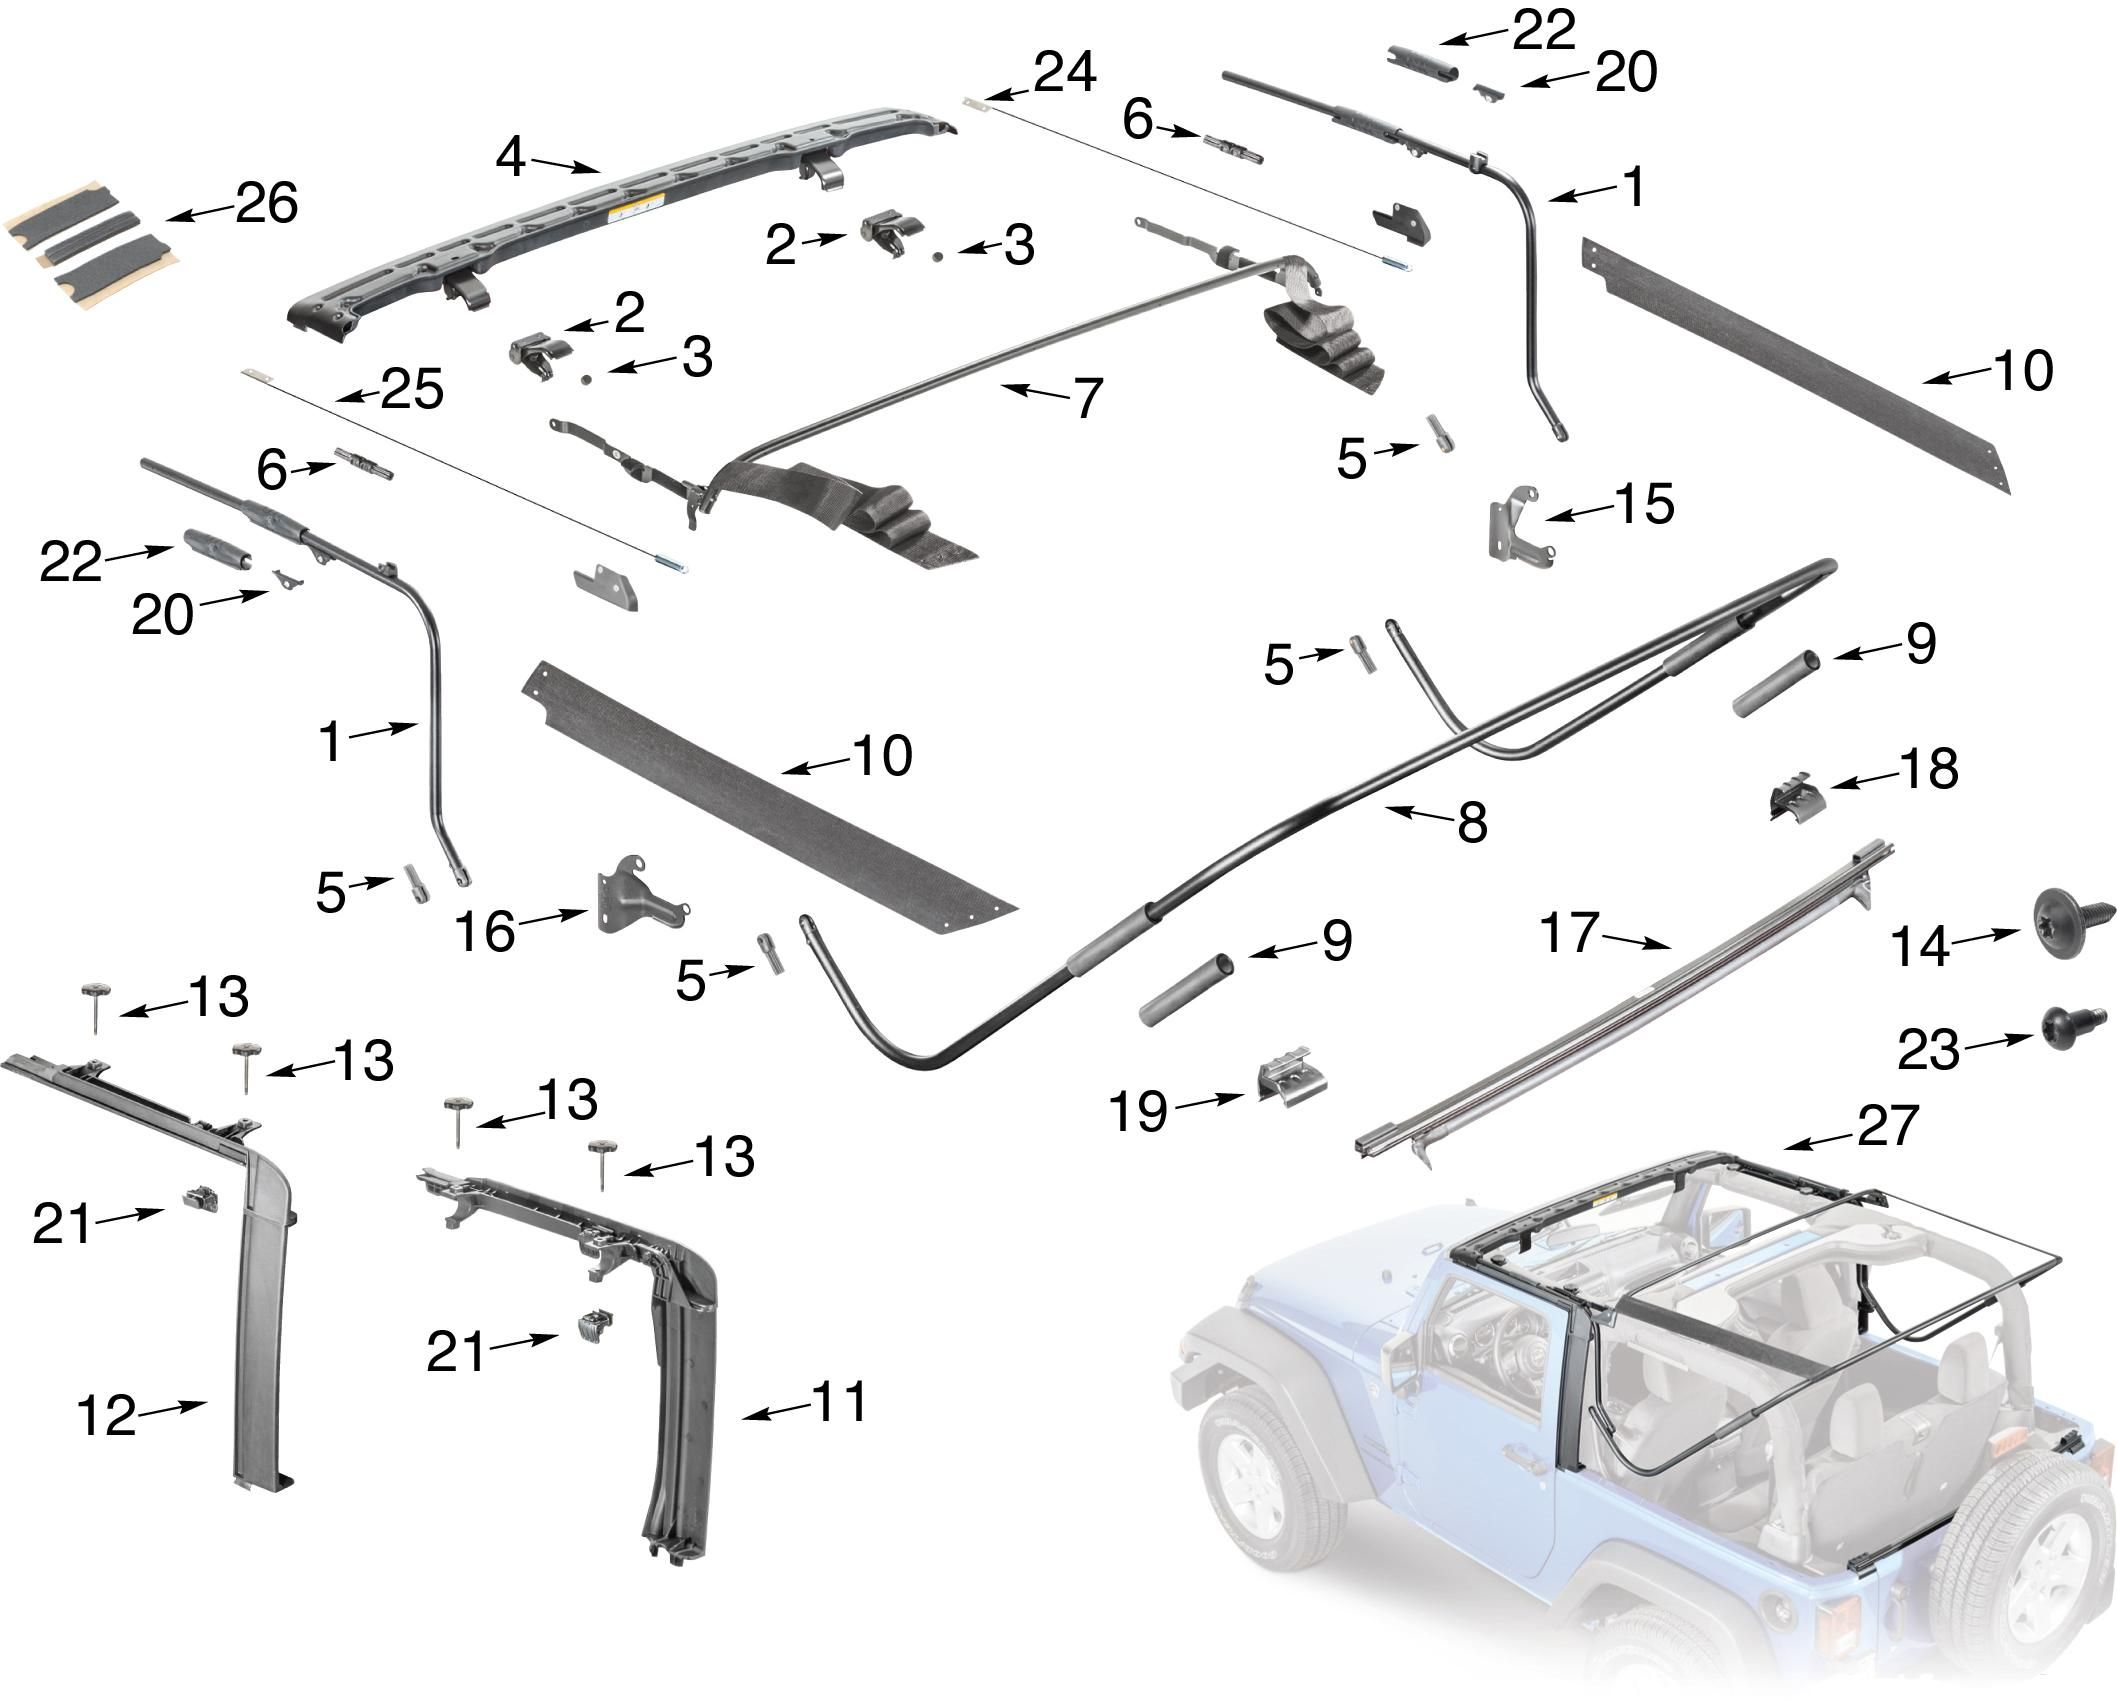 Jeep Wrangler Jk Soft Top Hardware Parts 2016 Fall